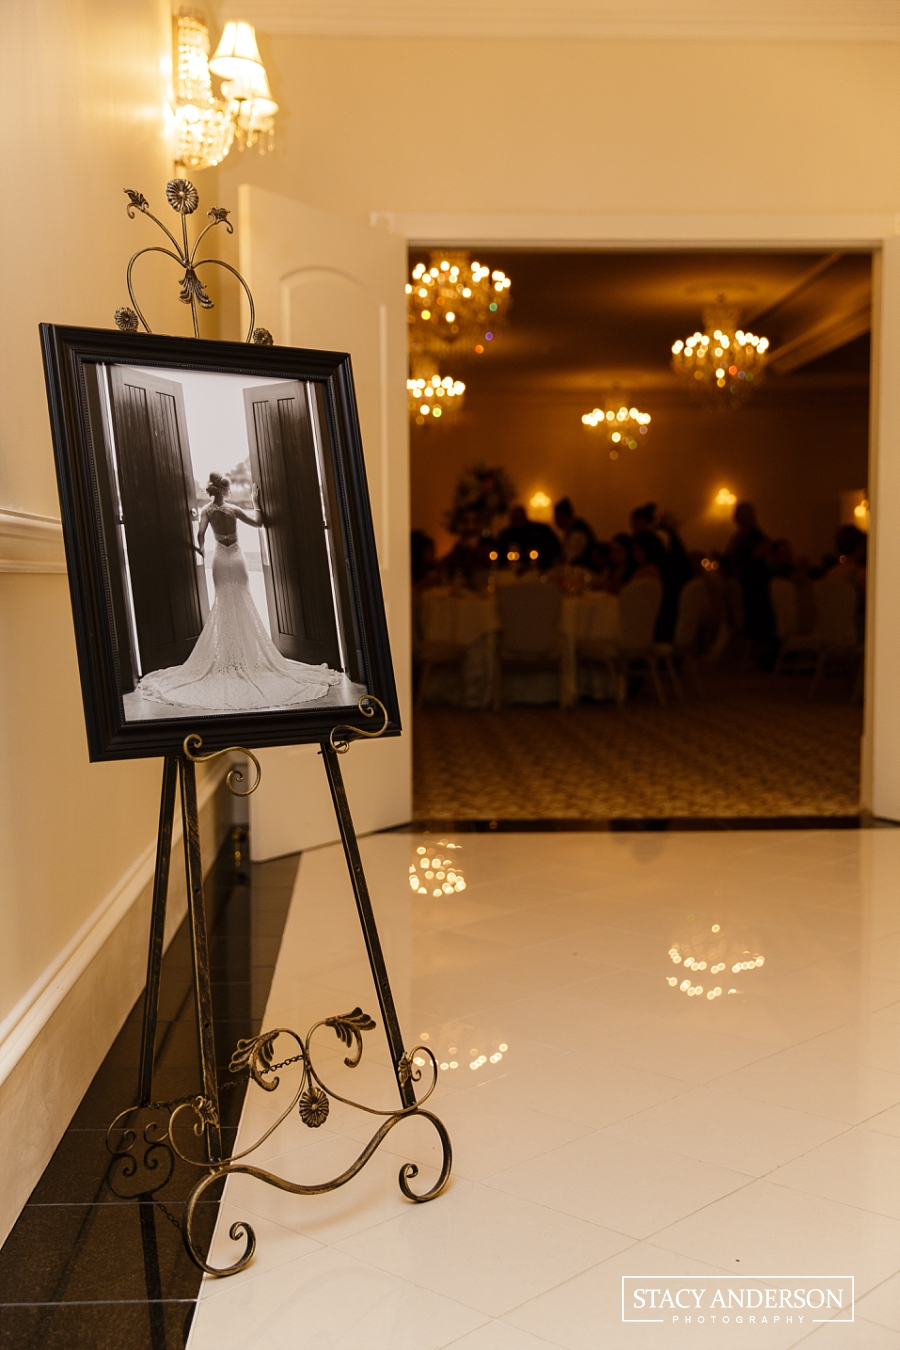 Stacy Anderson Photography Ashton Gardens Houston West Photographer_0025